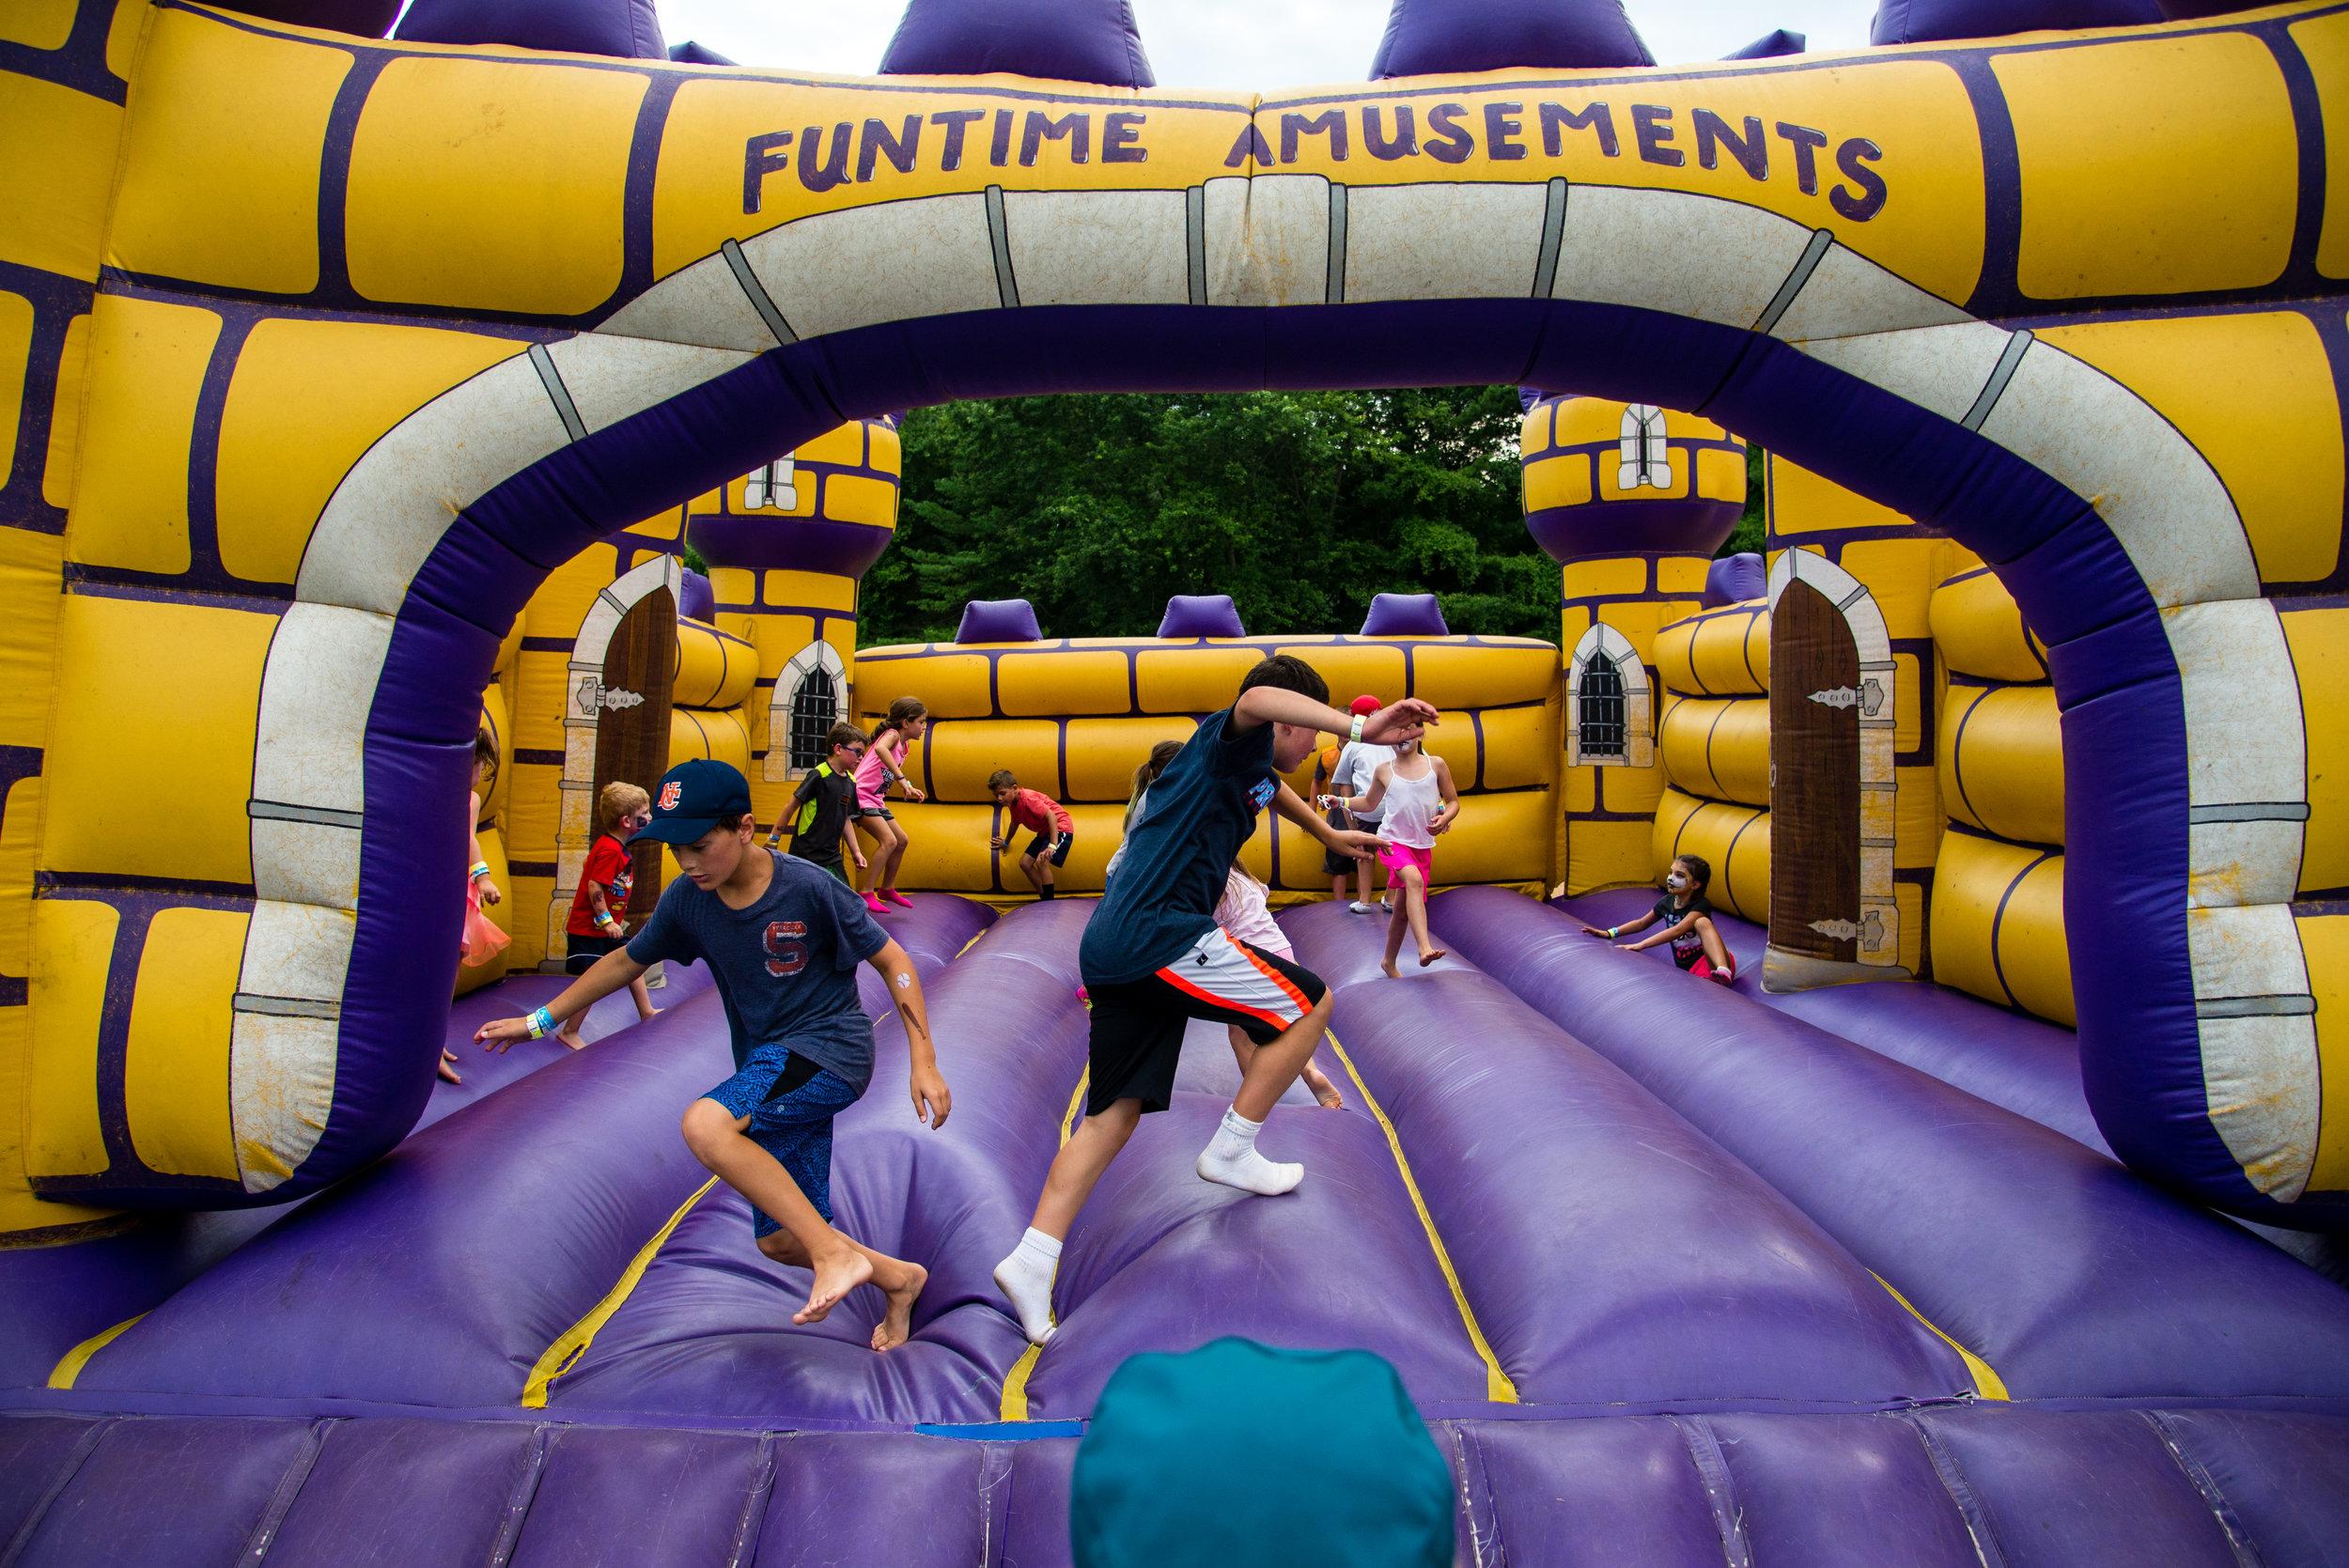 Bounce yer sillies out in the kids' fun zone © 2018 Vladimir Kolesnikov